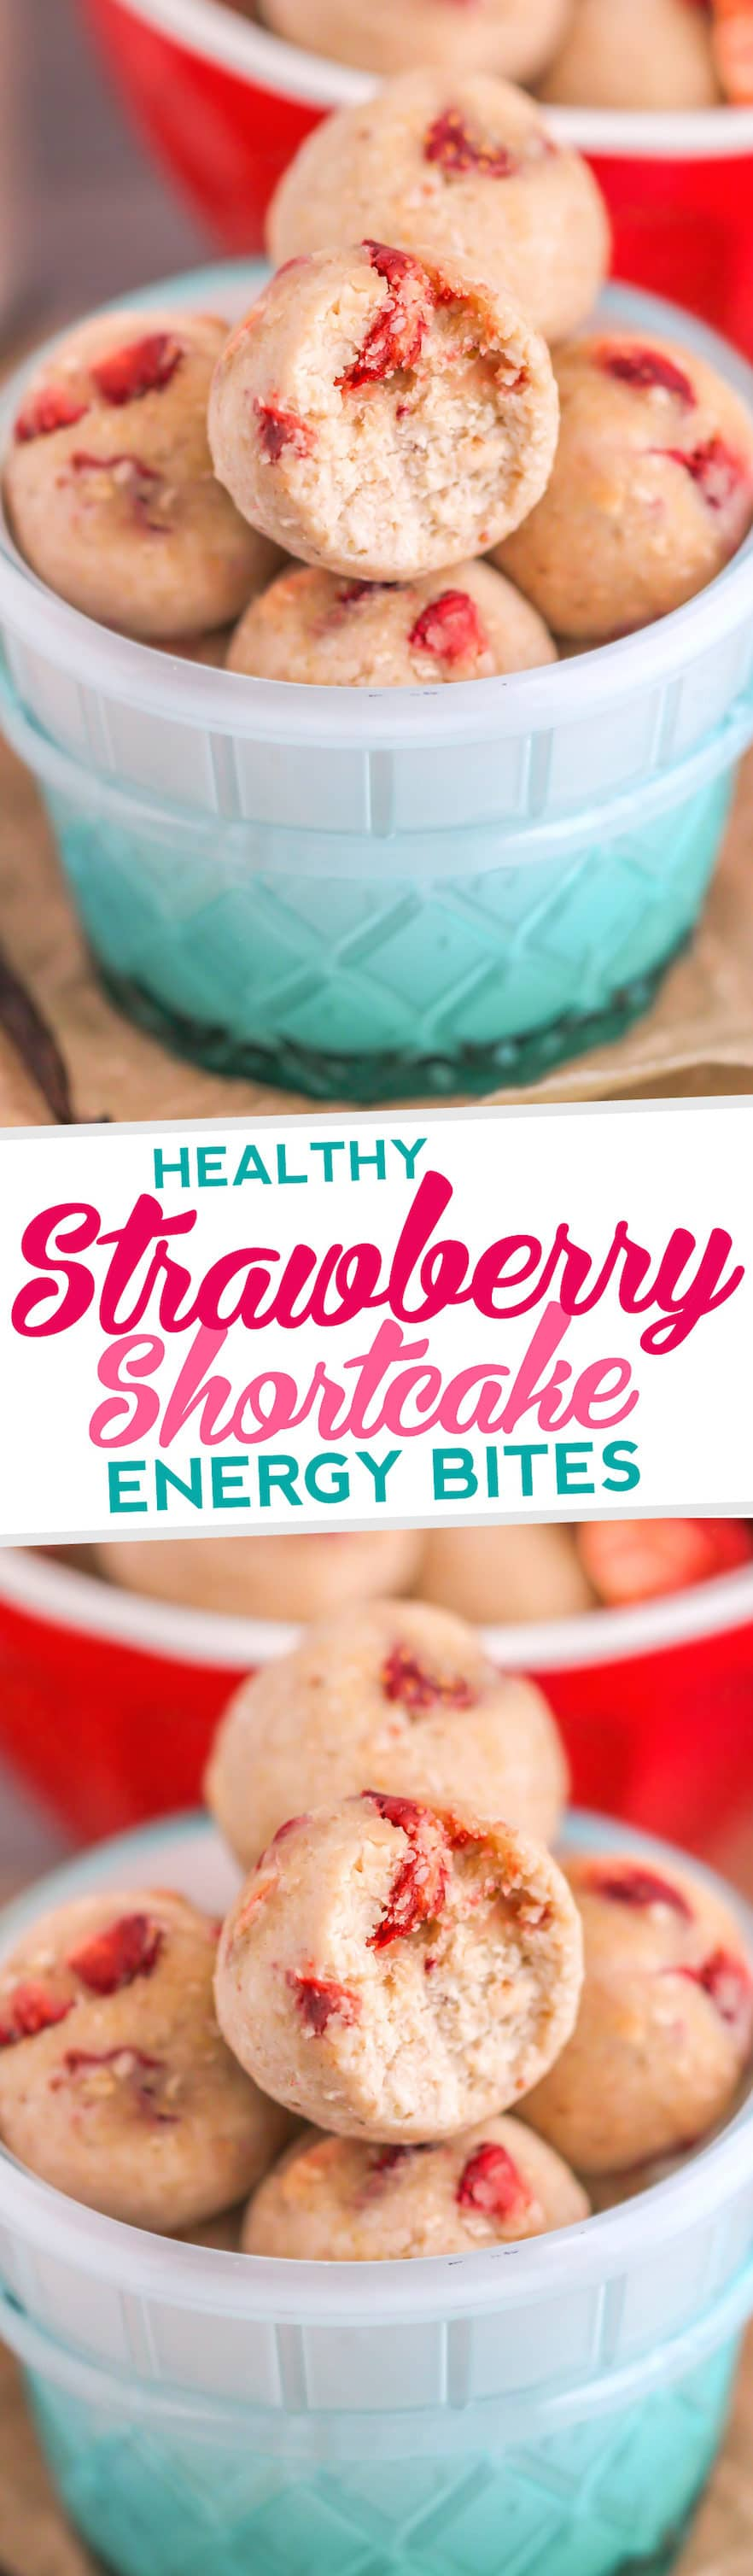 Healthy Strawberry Shortcake Energy Bites (refined sugar free, gluten free) - Desserts with Benefits